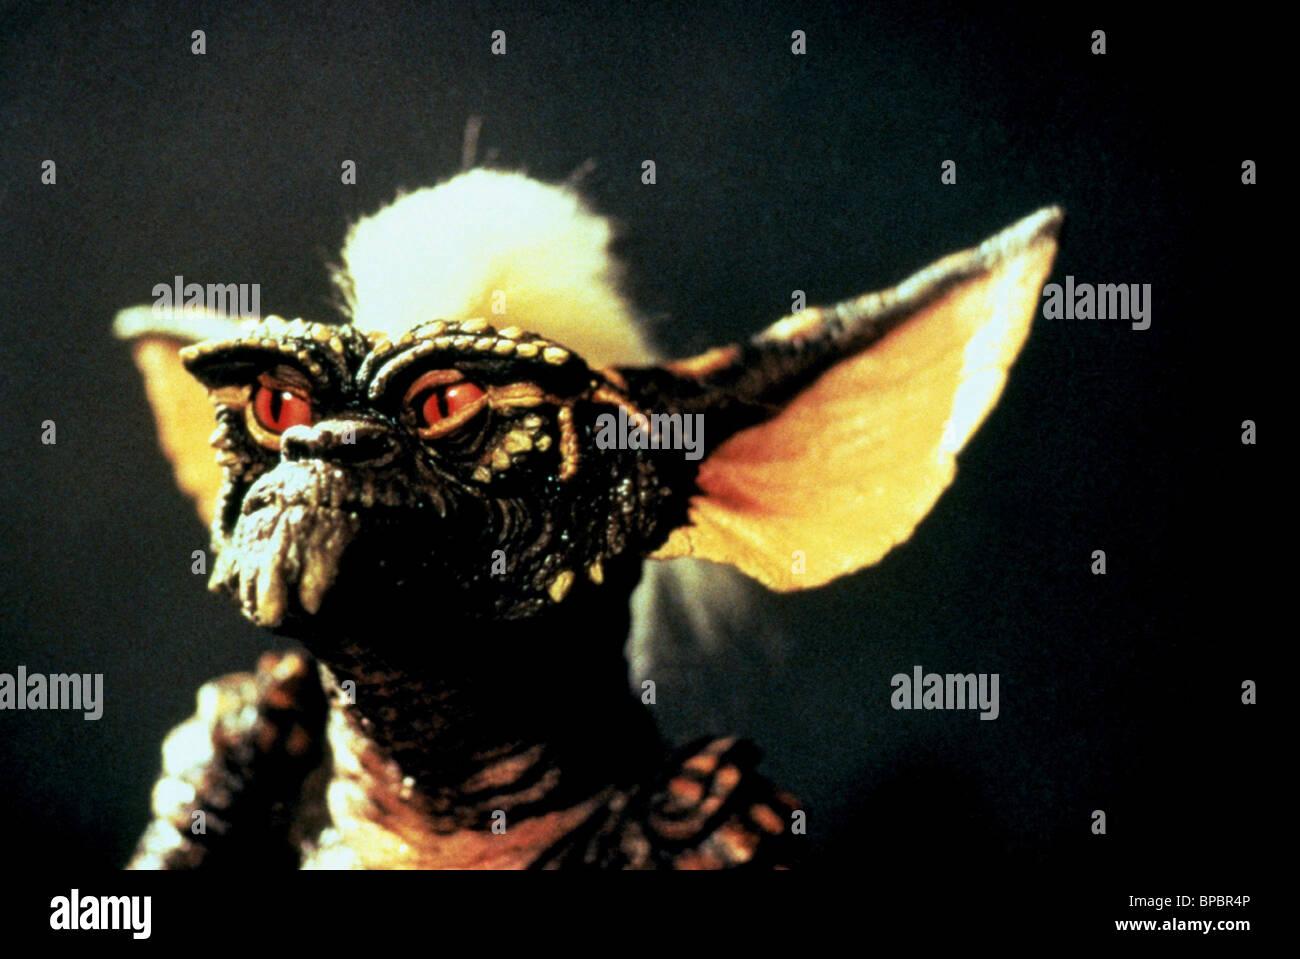 STRIPE GREMLIN aus dem Film GREMLINS (1984) Stockbild